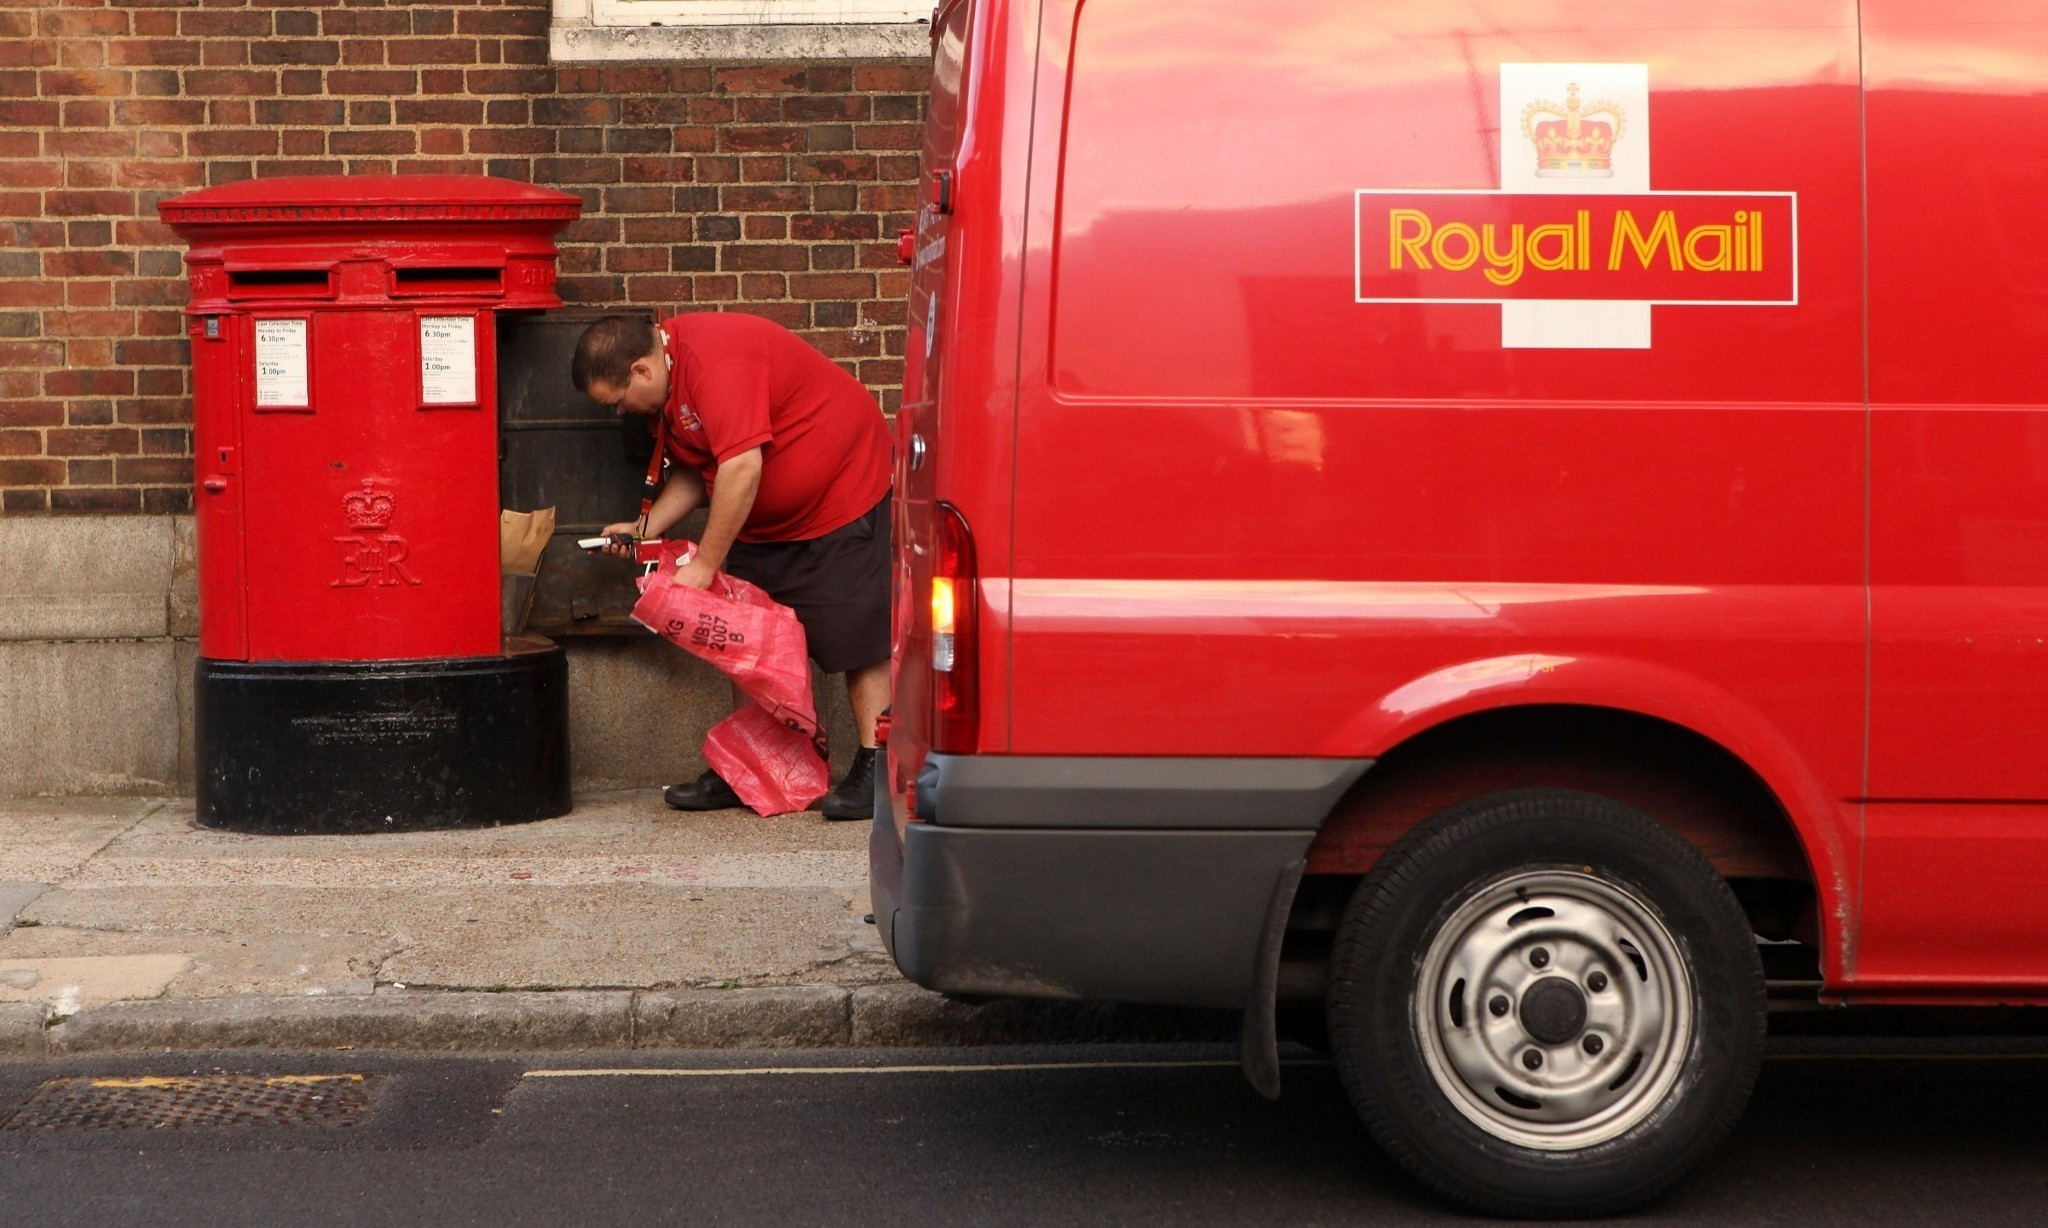 Royal Mail seeks injunction to halt 48-hour postal strike